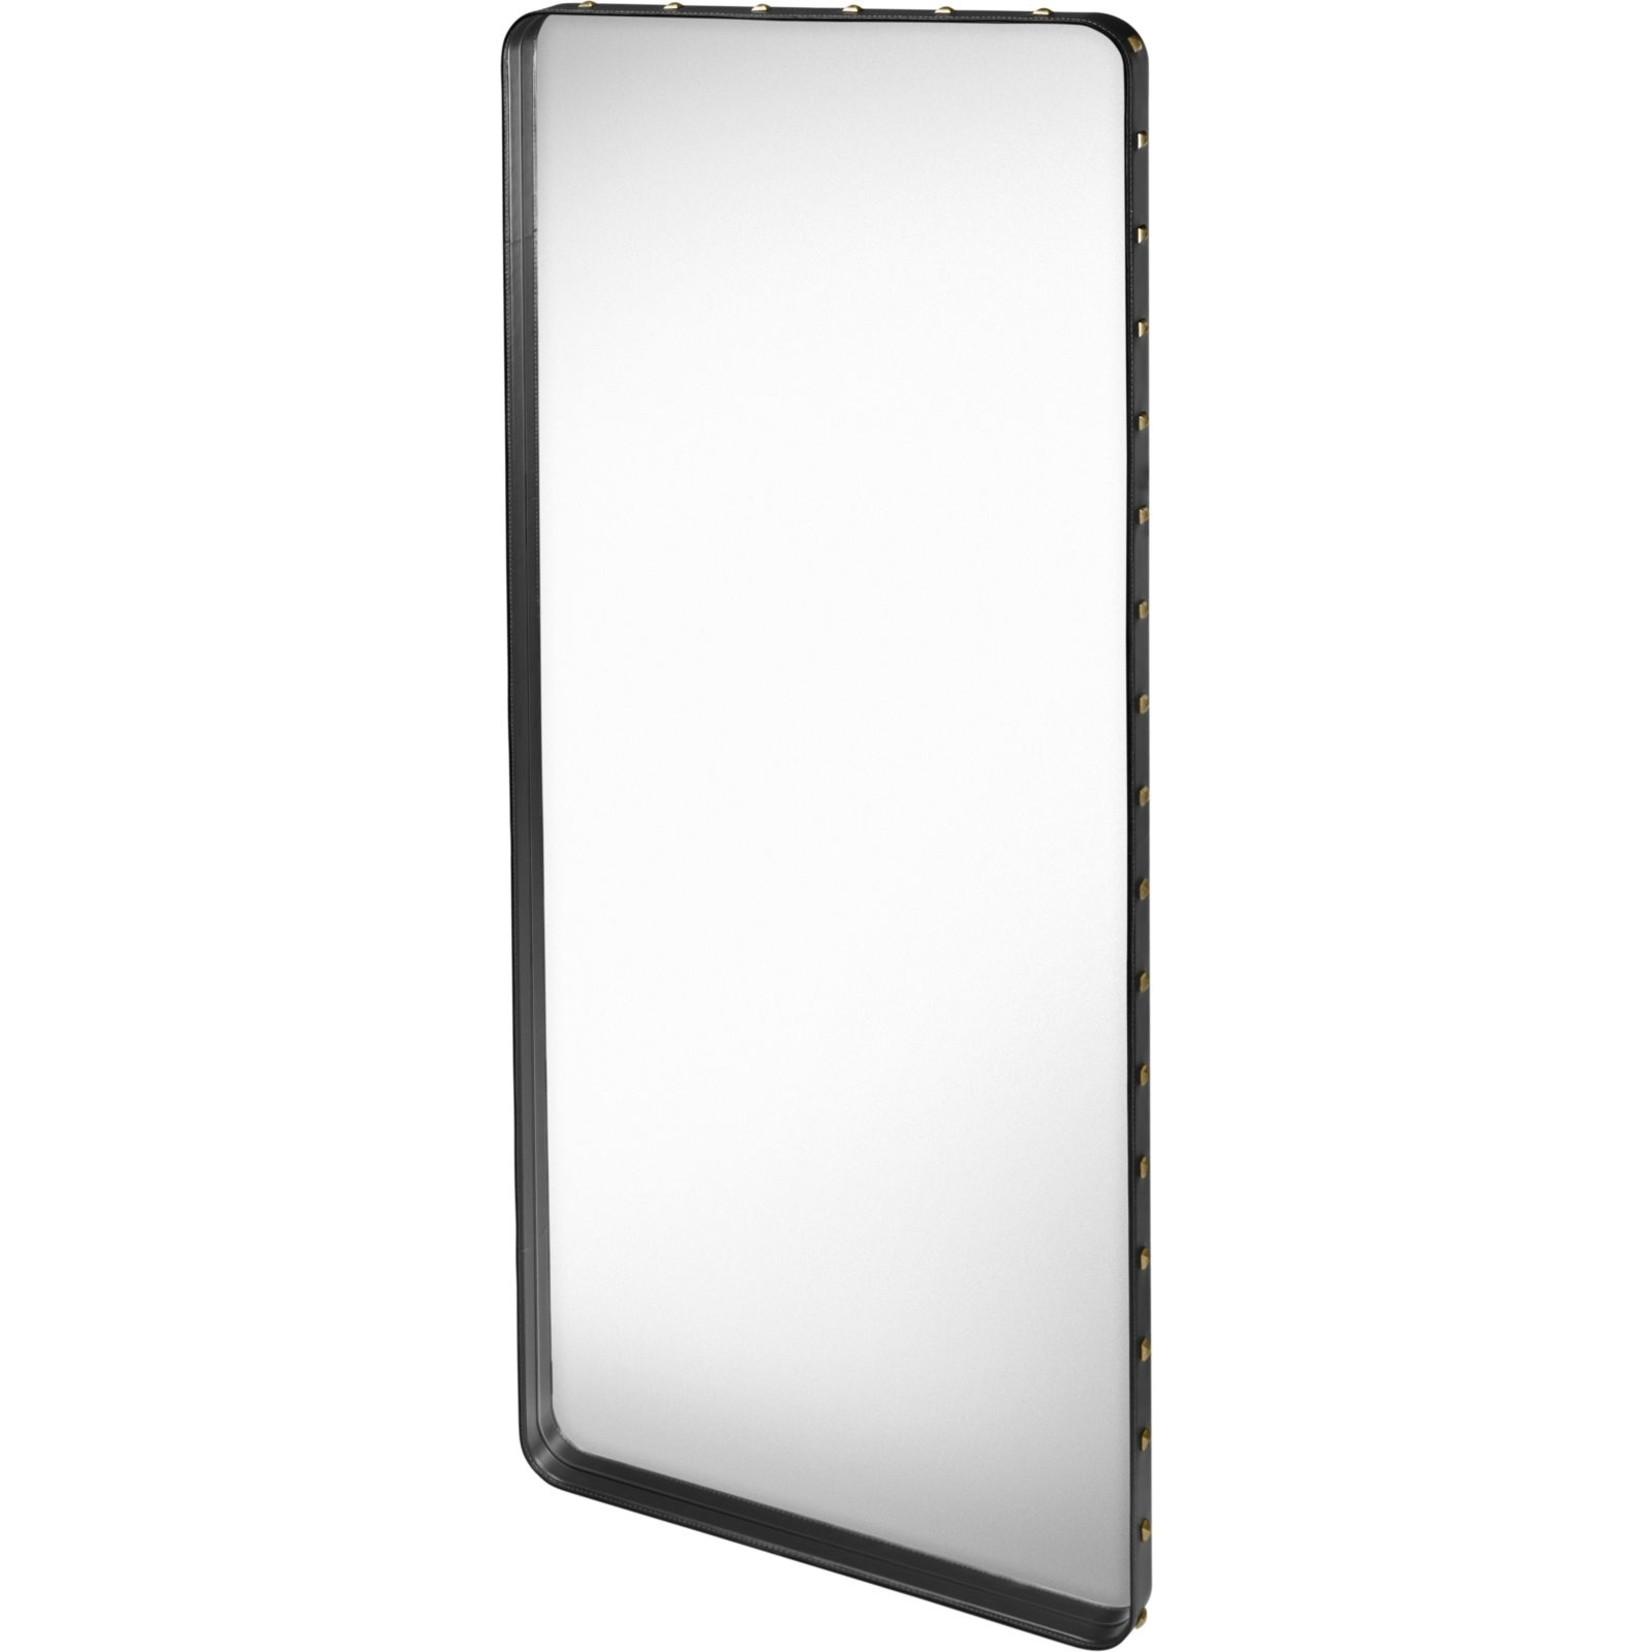 Gubi Wandspiegel Adnet - Rechthoekig - 70x180 - Black Leather